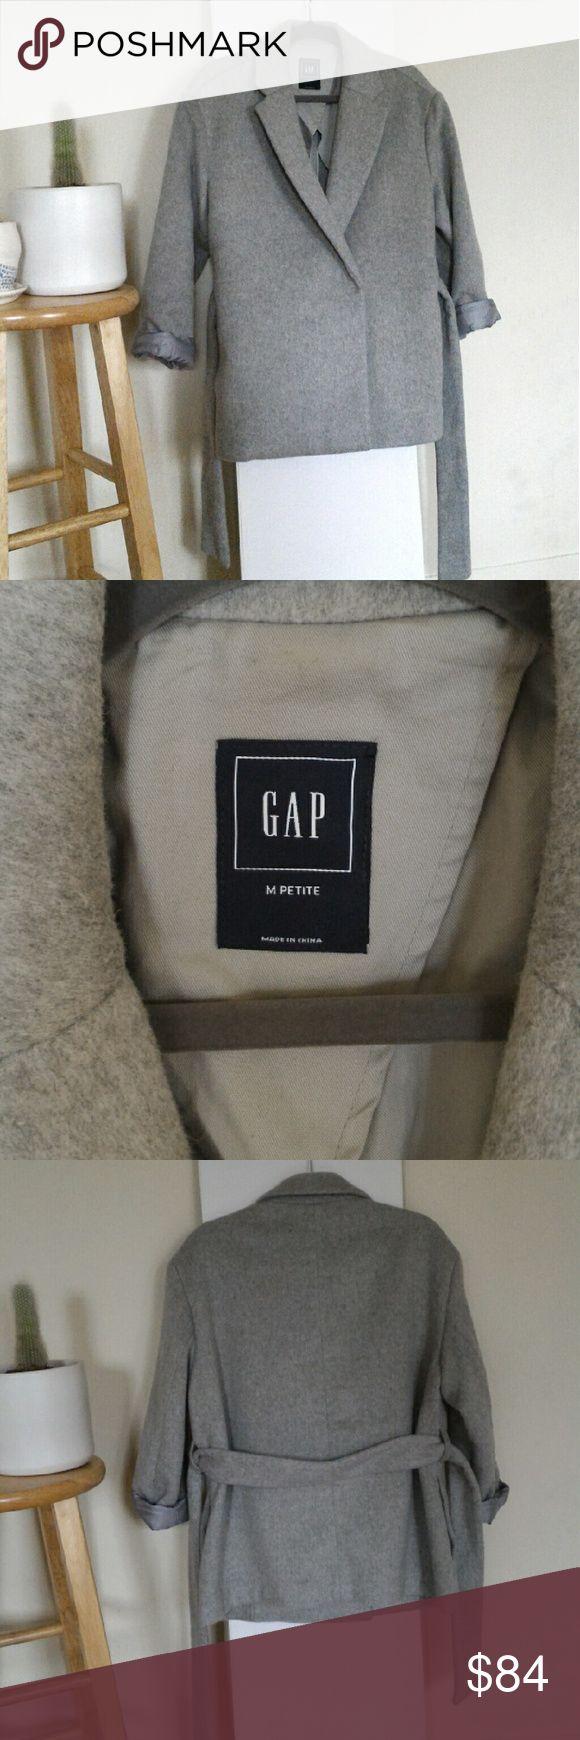 Gap Coat Brand new. Never worn. Light grey coat. GAP Jackets & Coats